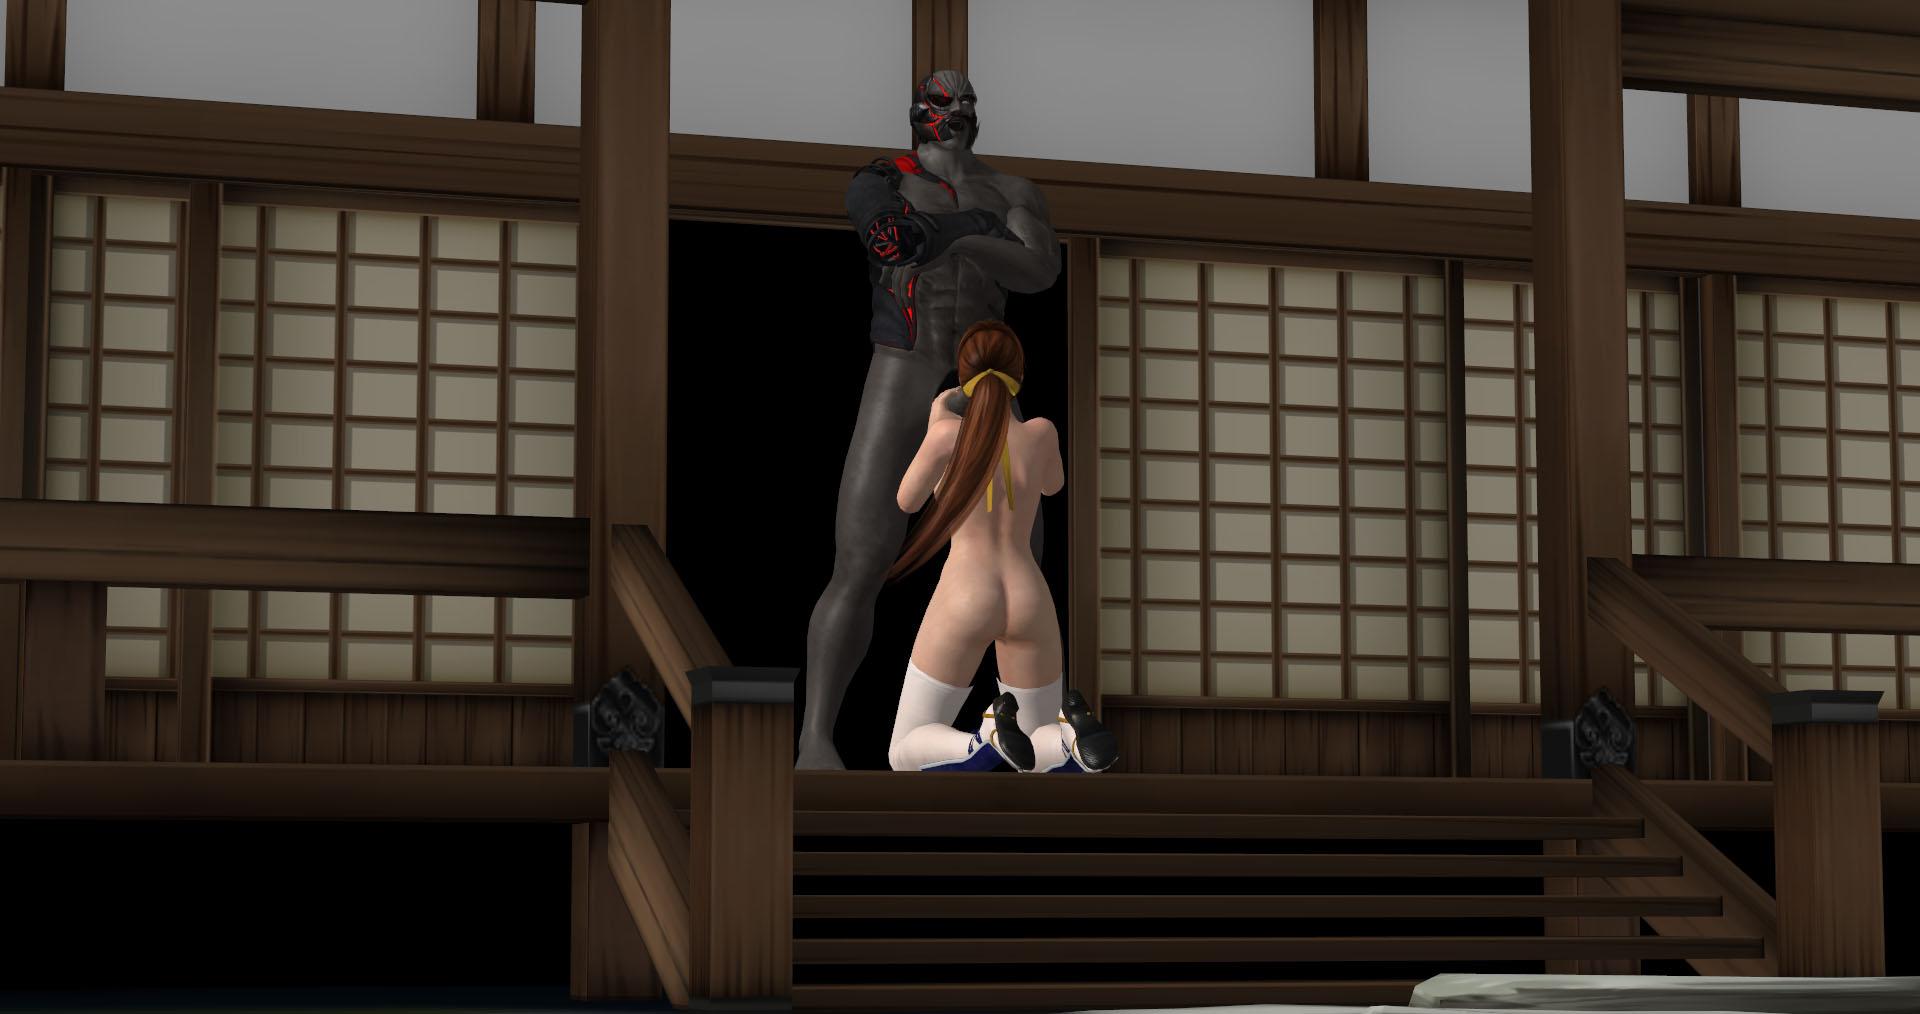 raidou_raping_kunoichi_0015_layer_42_by_bitemonsters-dbgv5jp.jpg